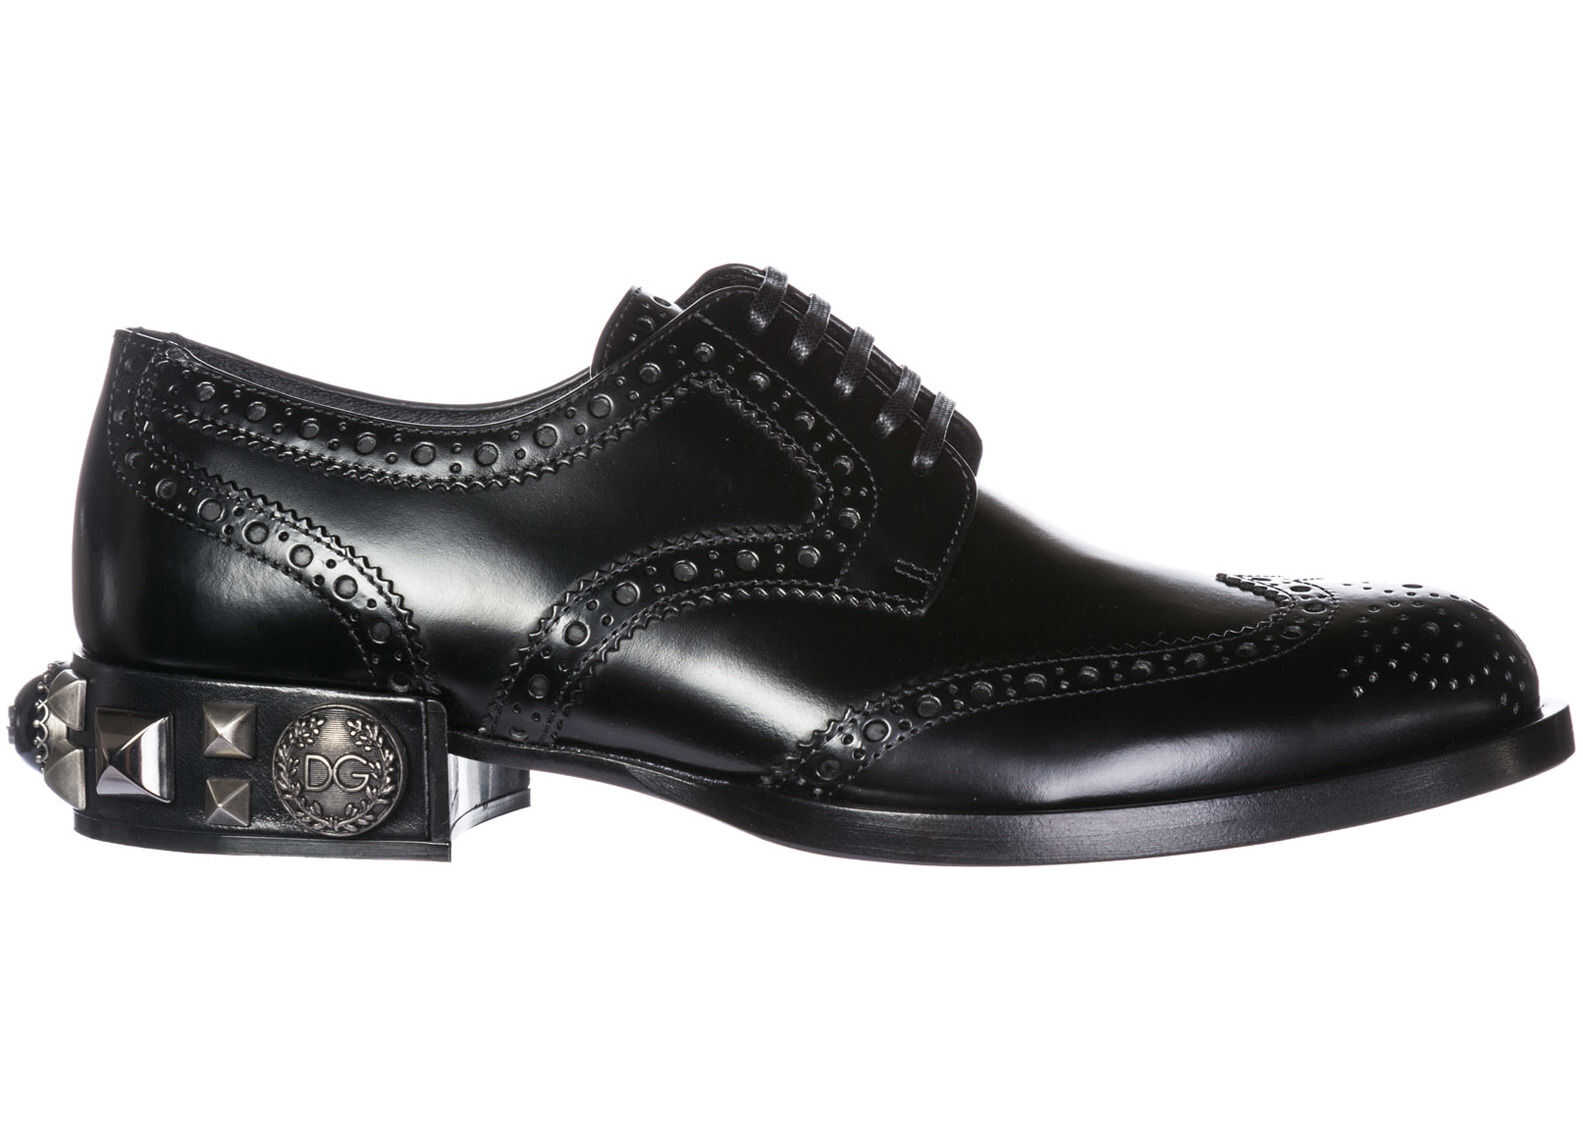 Dolce & Gabbana Shoes Derby Black